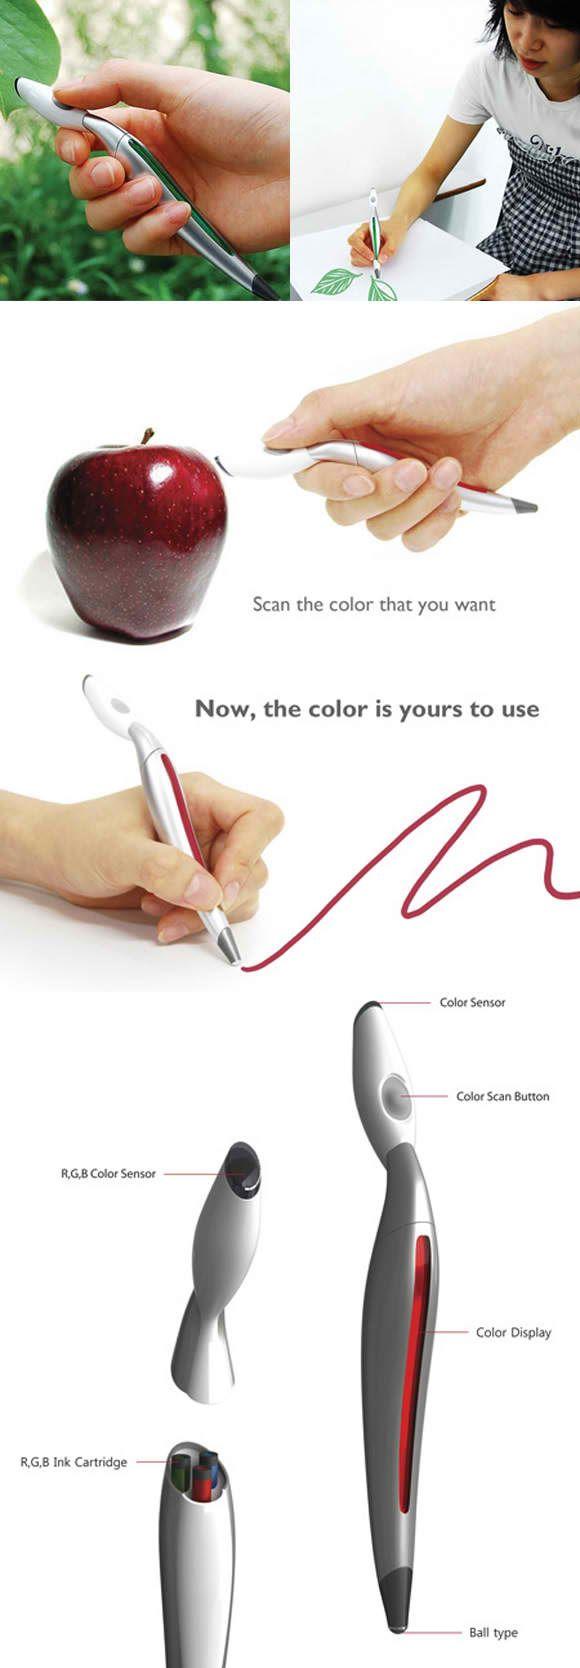 innovative color picker.